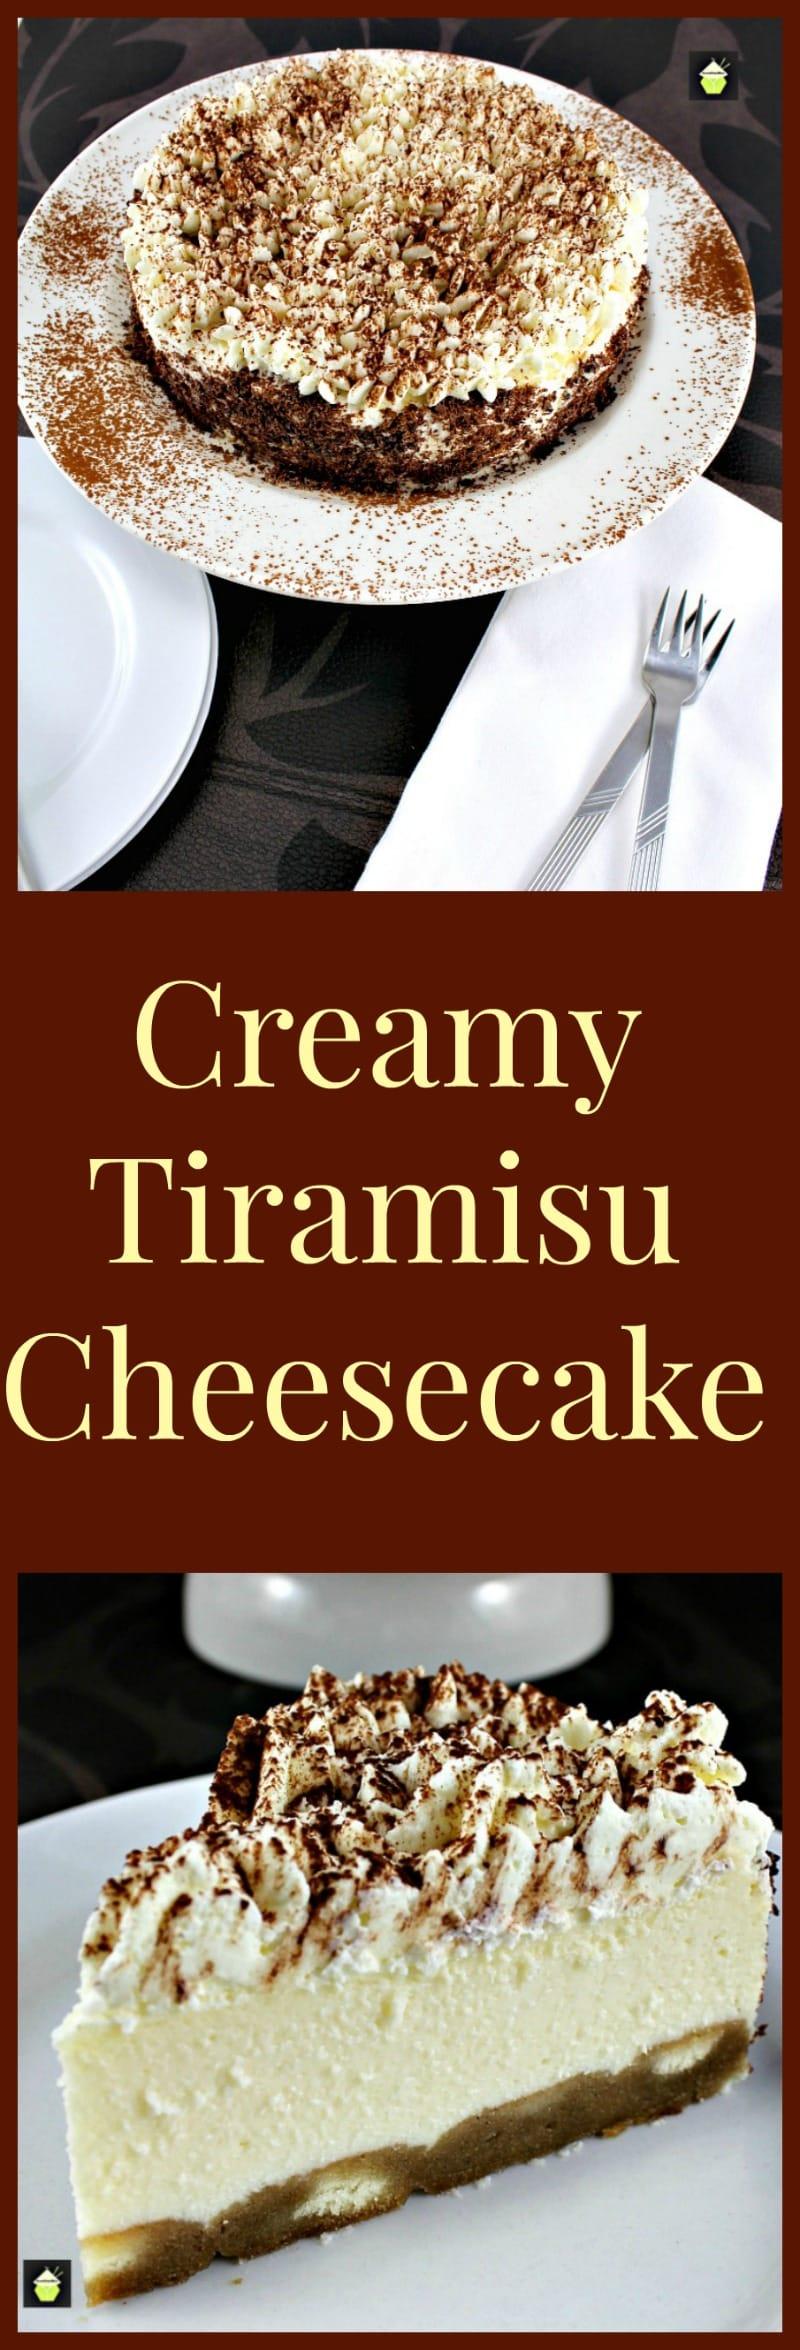 Creamy Tiramisu Cheesecake. This is a lovely dessert with the flavors of the classic Italian Tiramisu. If you like Tiramisu then you will enjoy this! | Lovefoodies.com